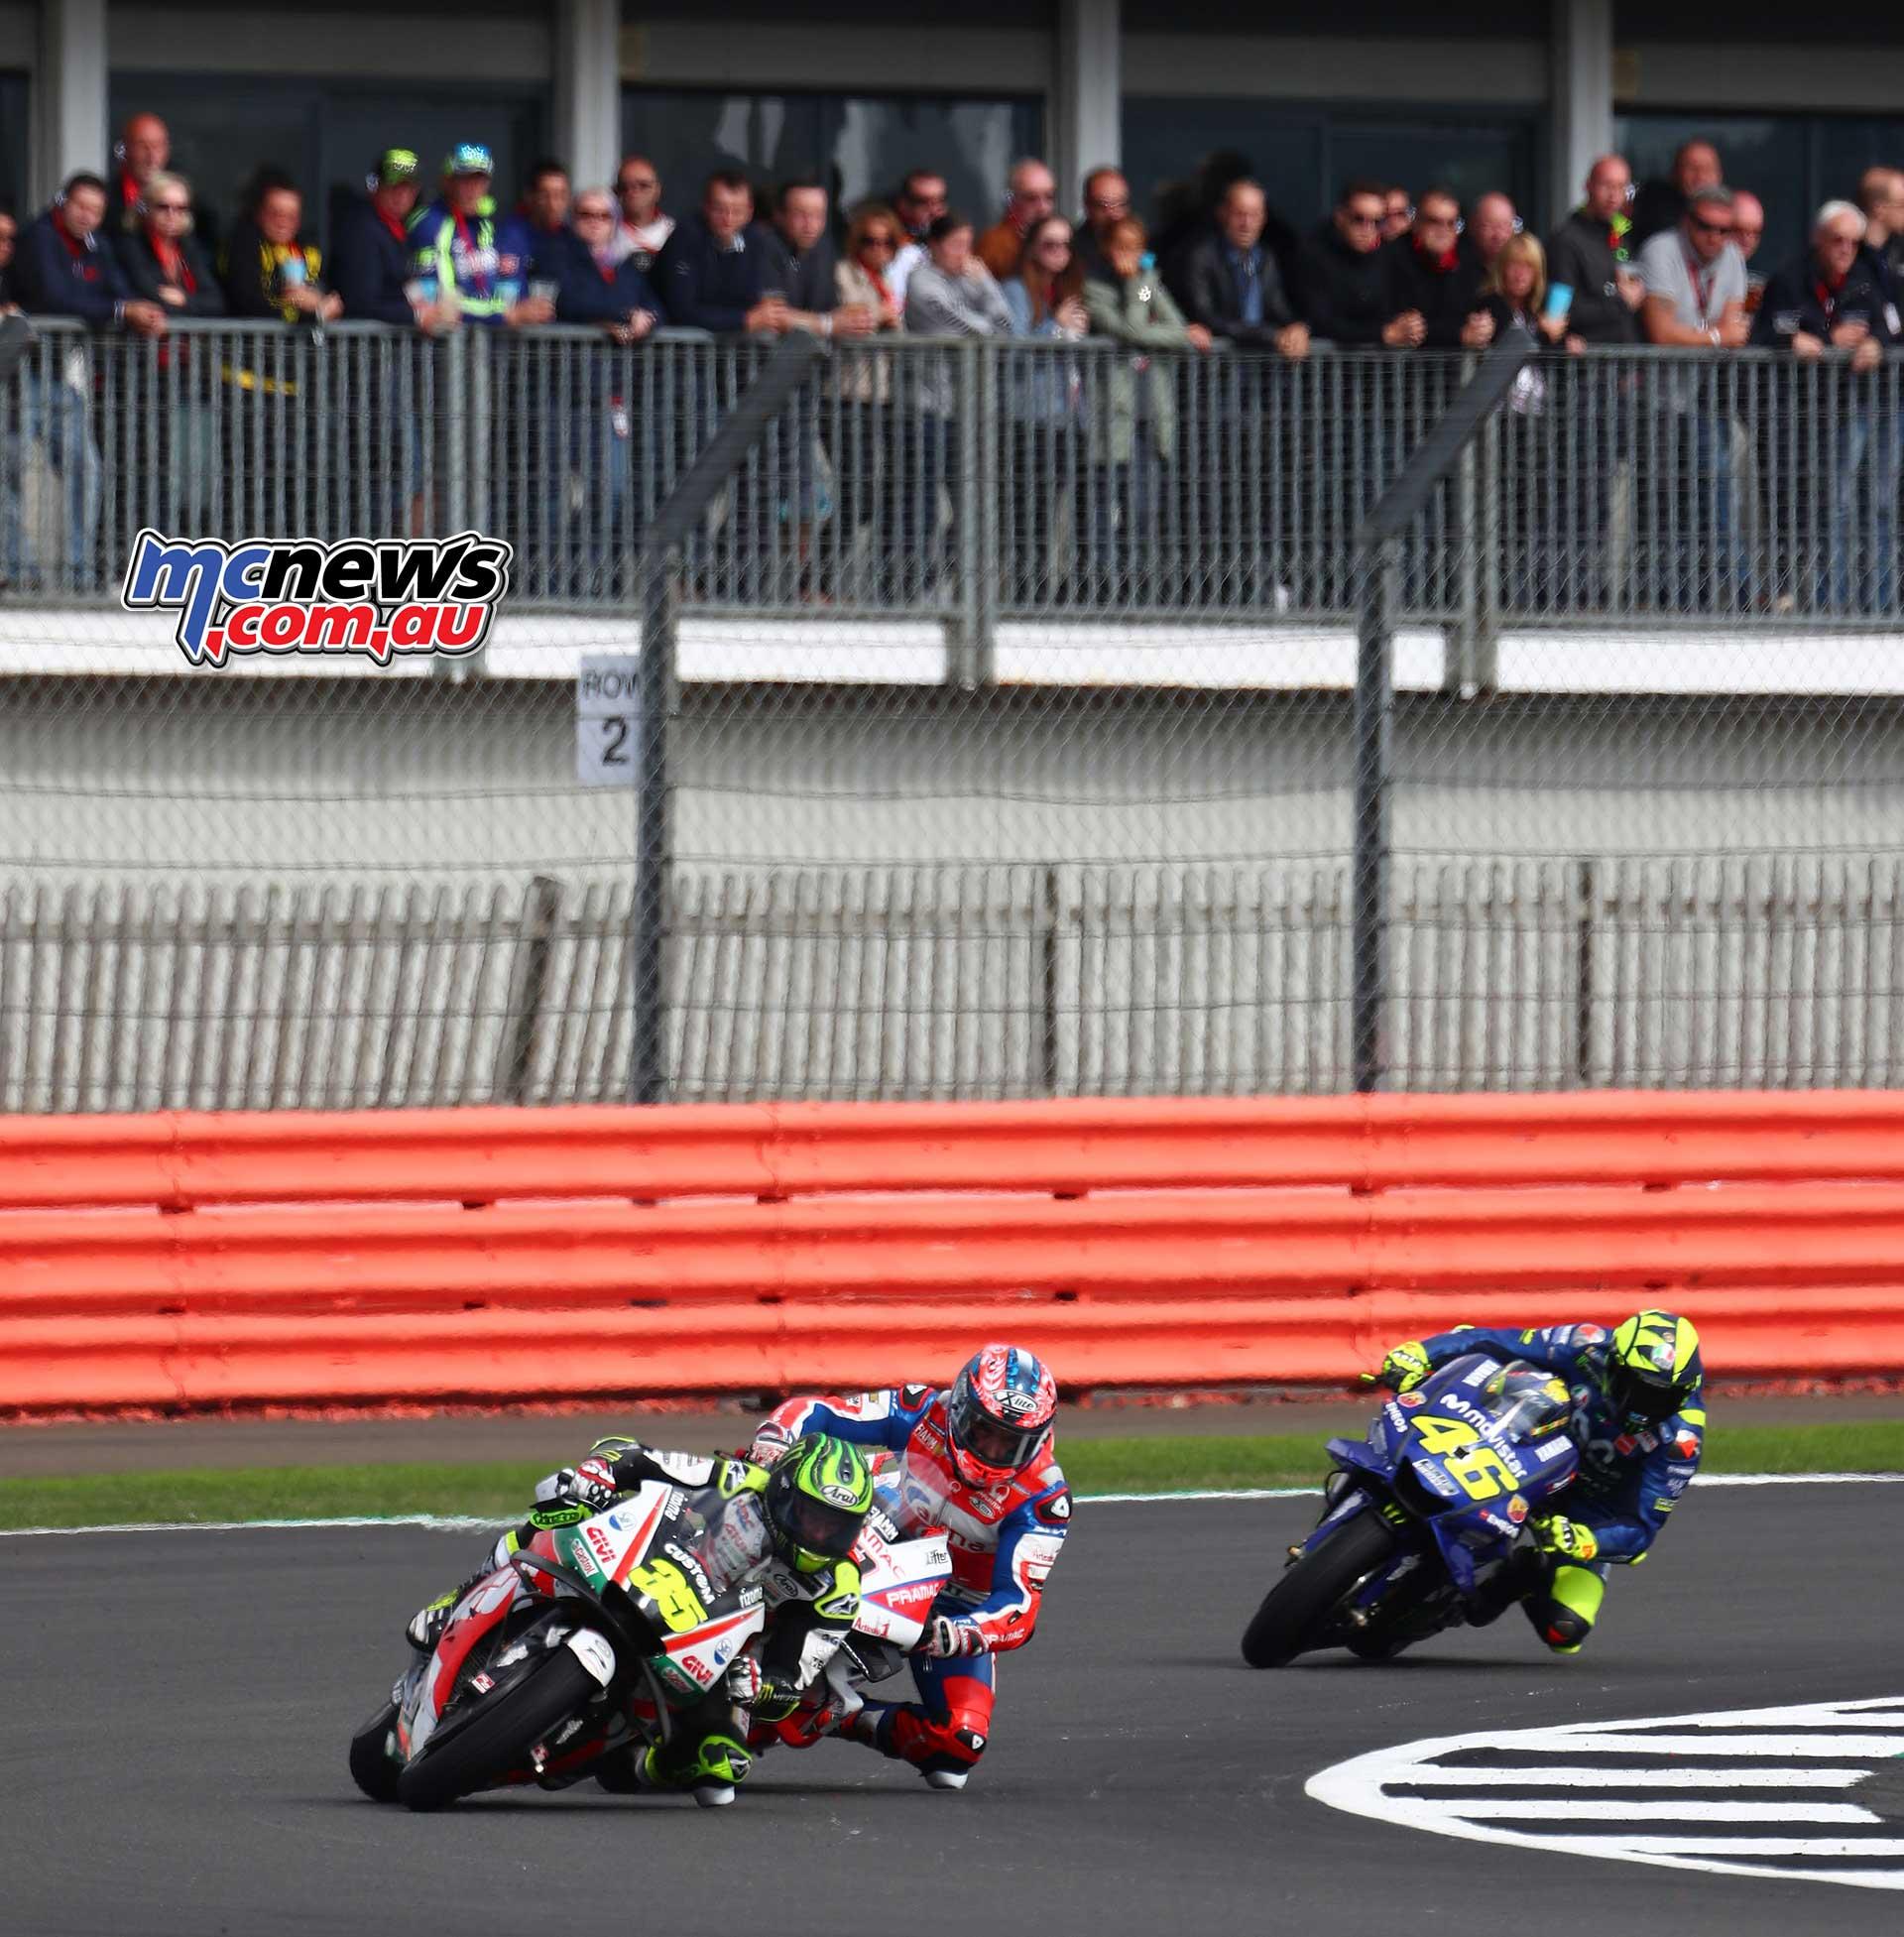 Motogp 2018: 2018 Silverstone MotoGP